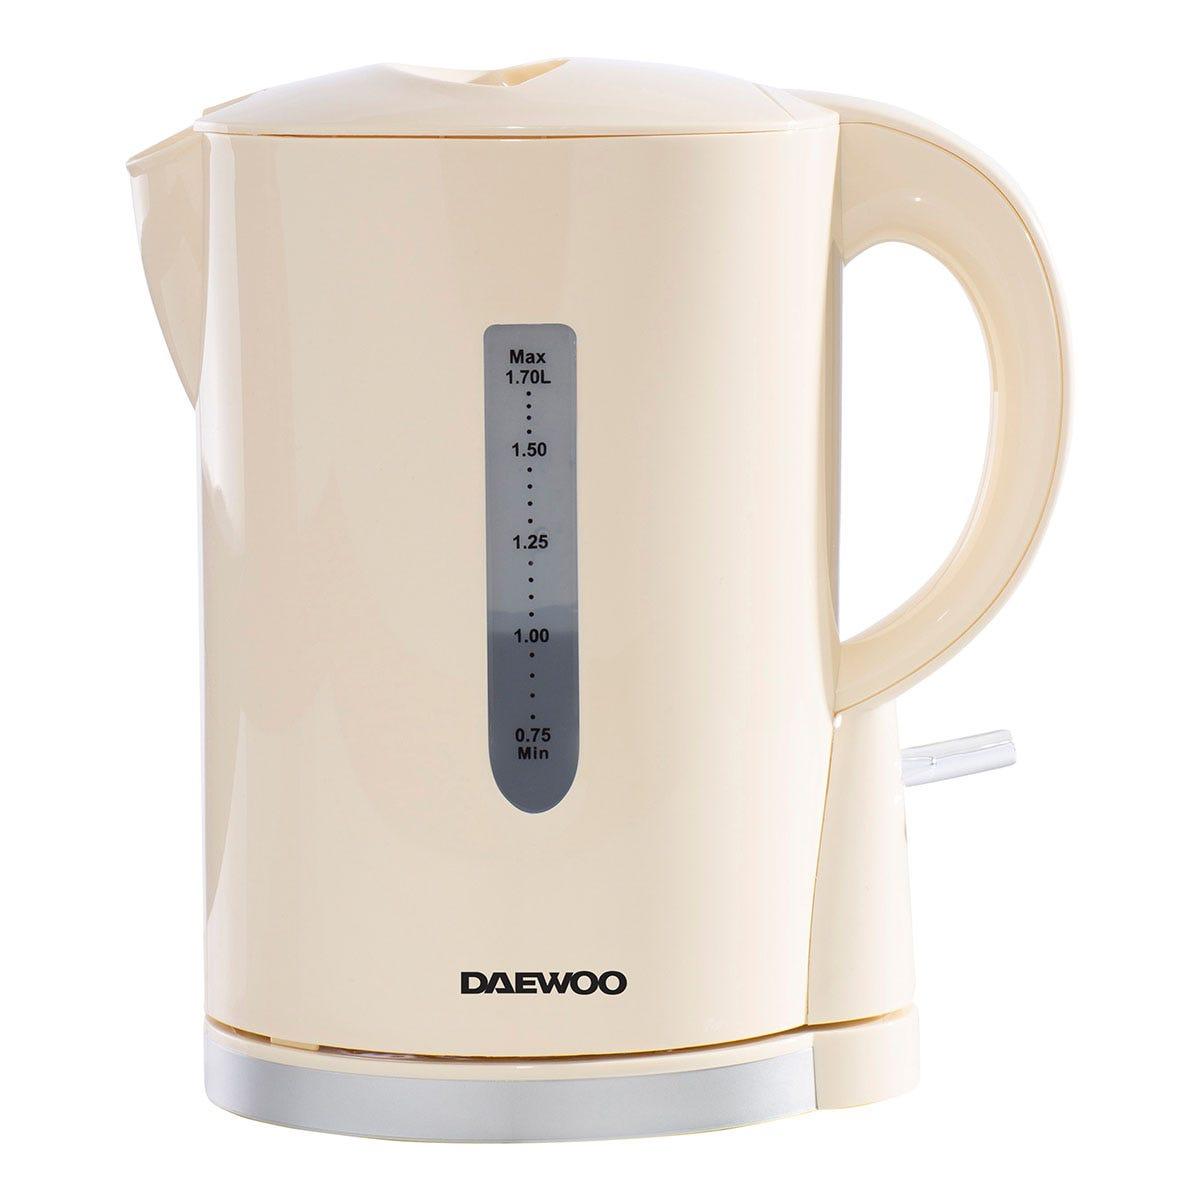 Daewoo SDA1683 2200W 1.7L Plastic Kettle - Cream with Chrome Band